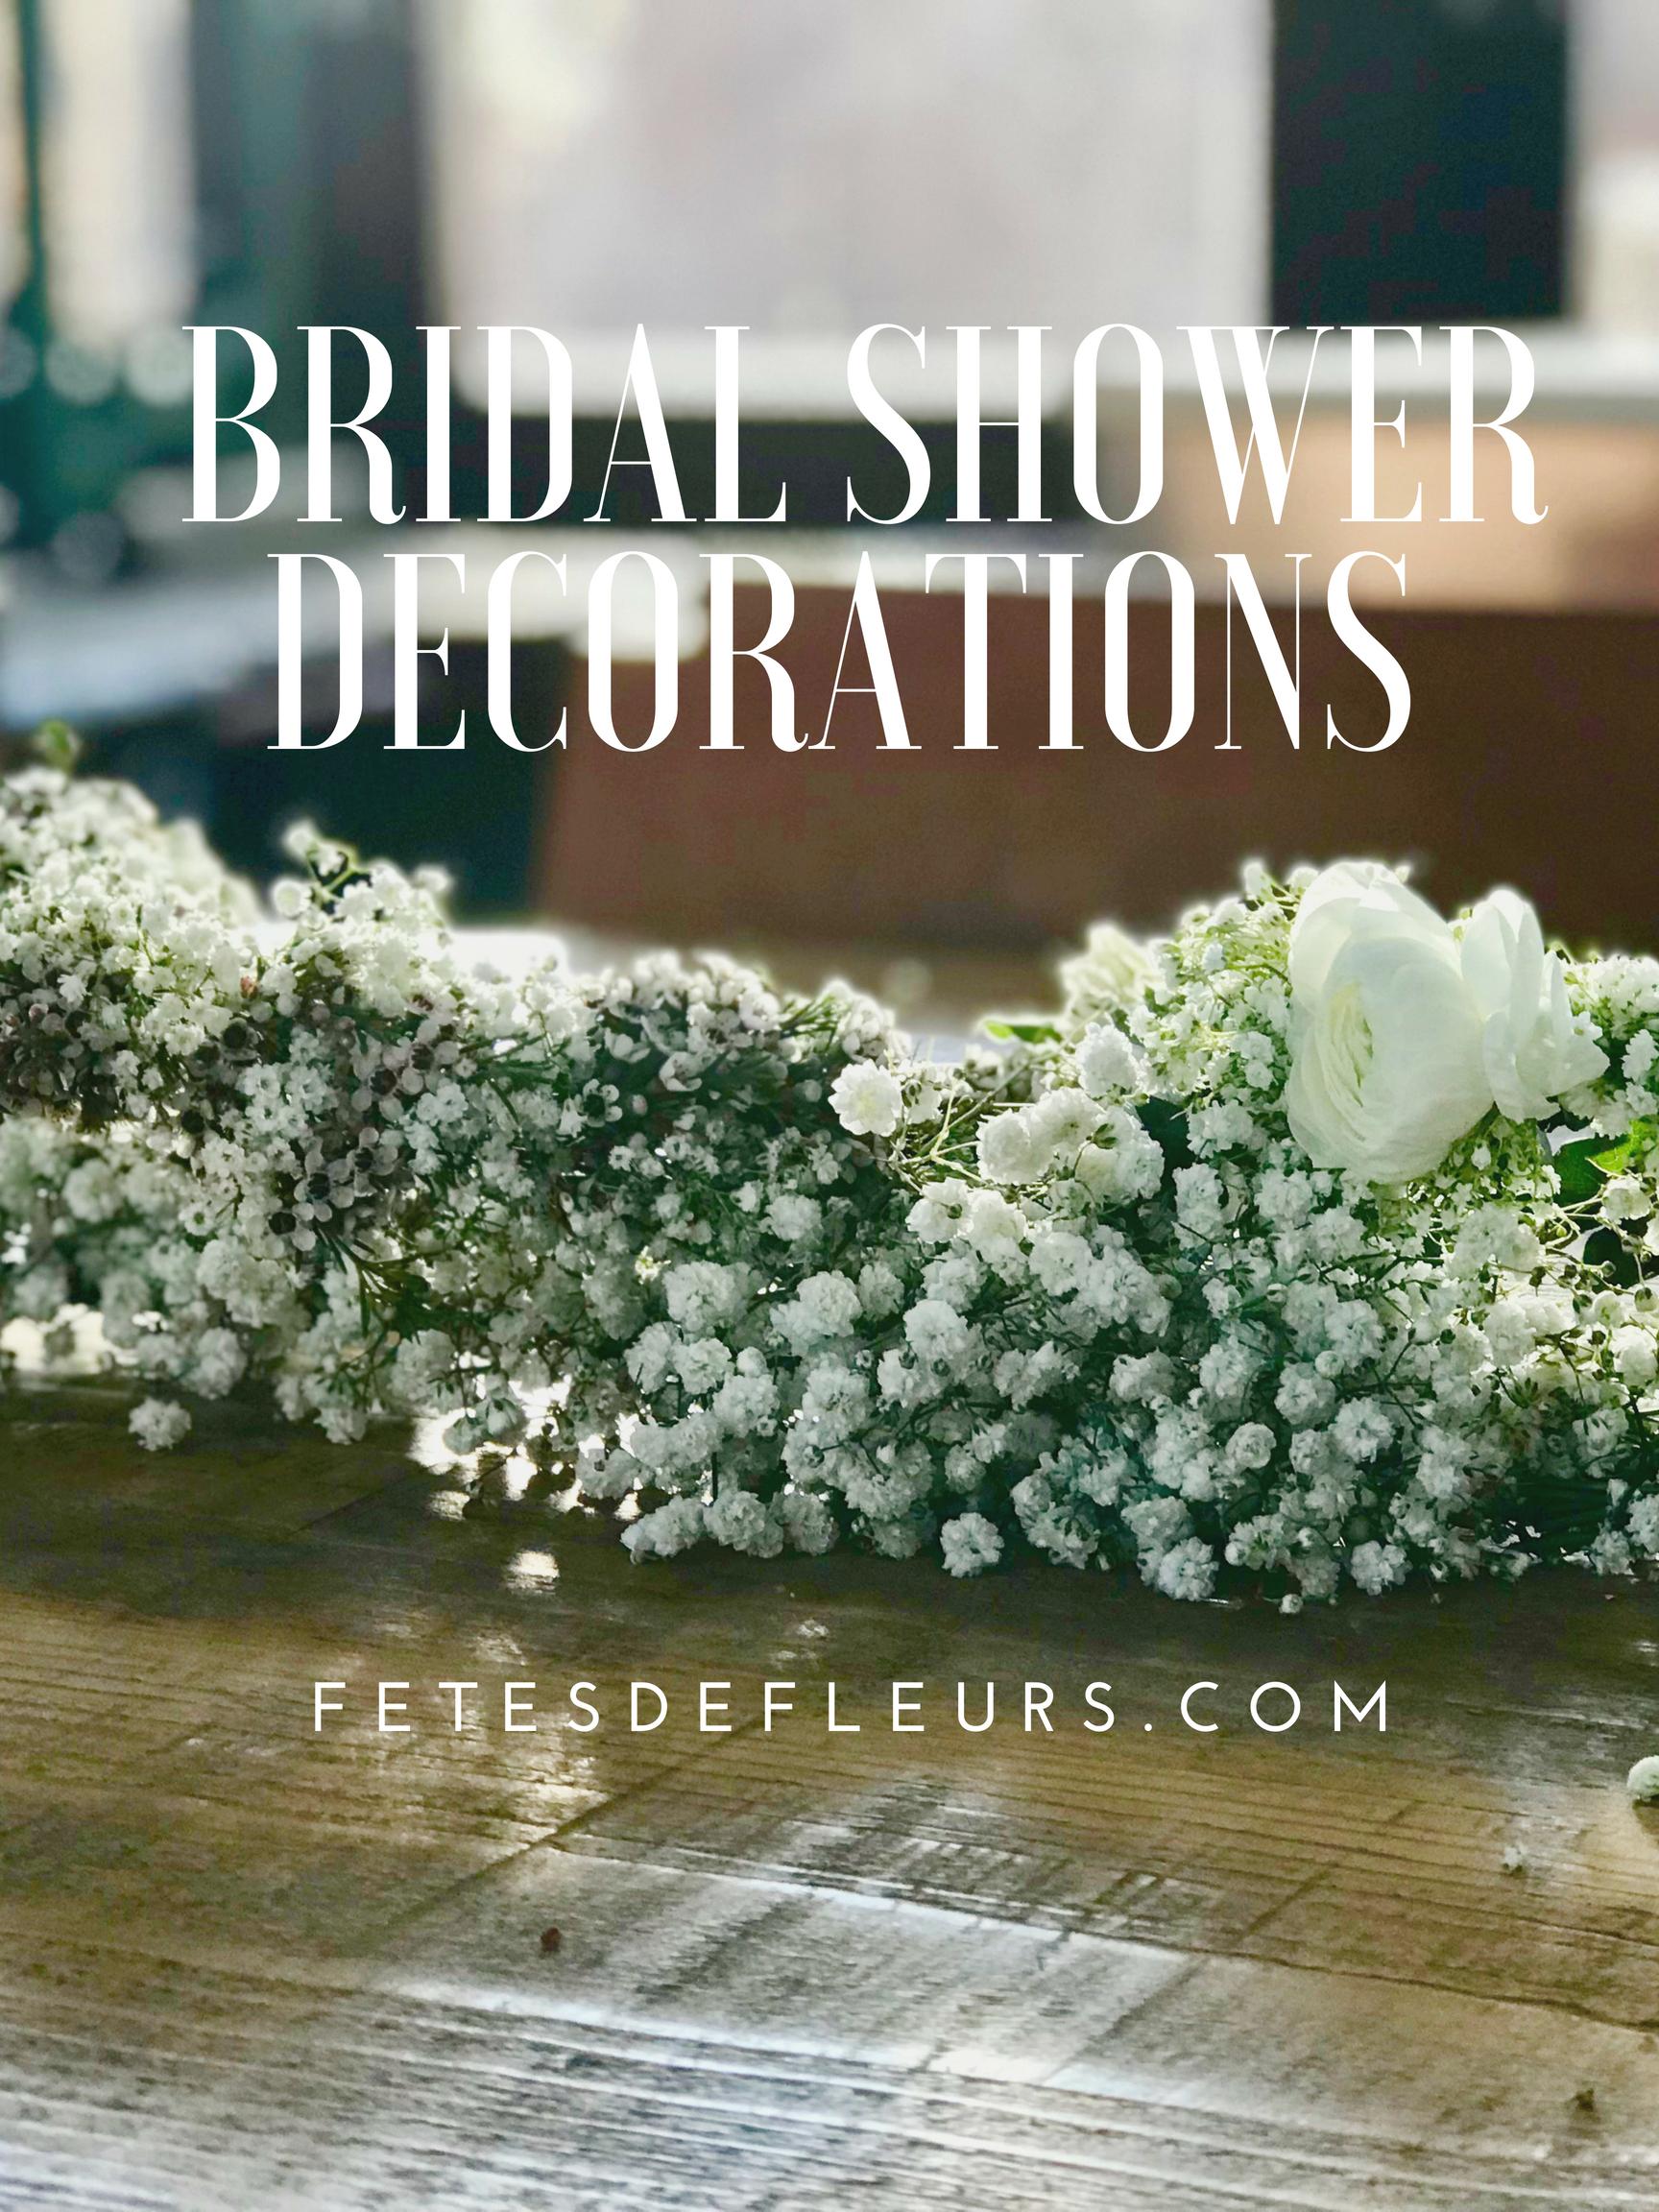 Bridal Shower Decorations